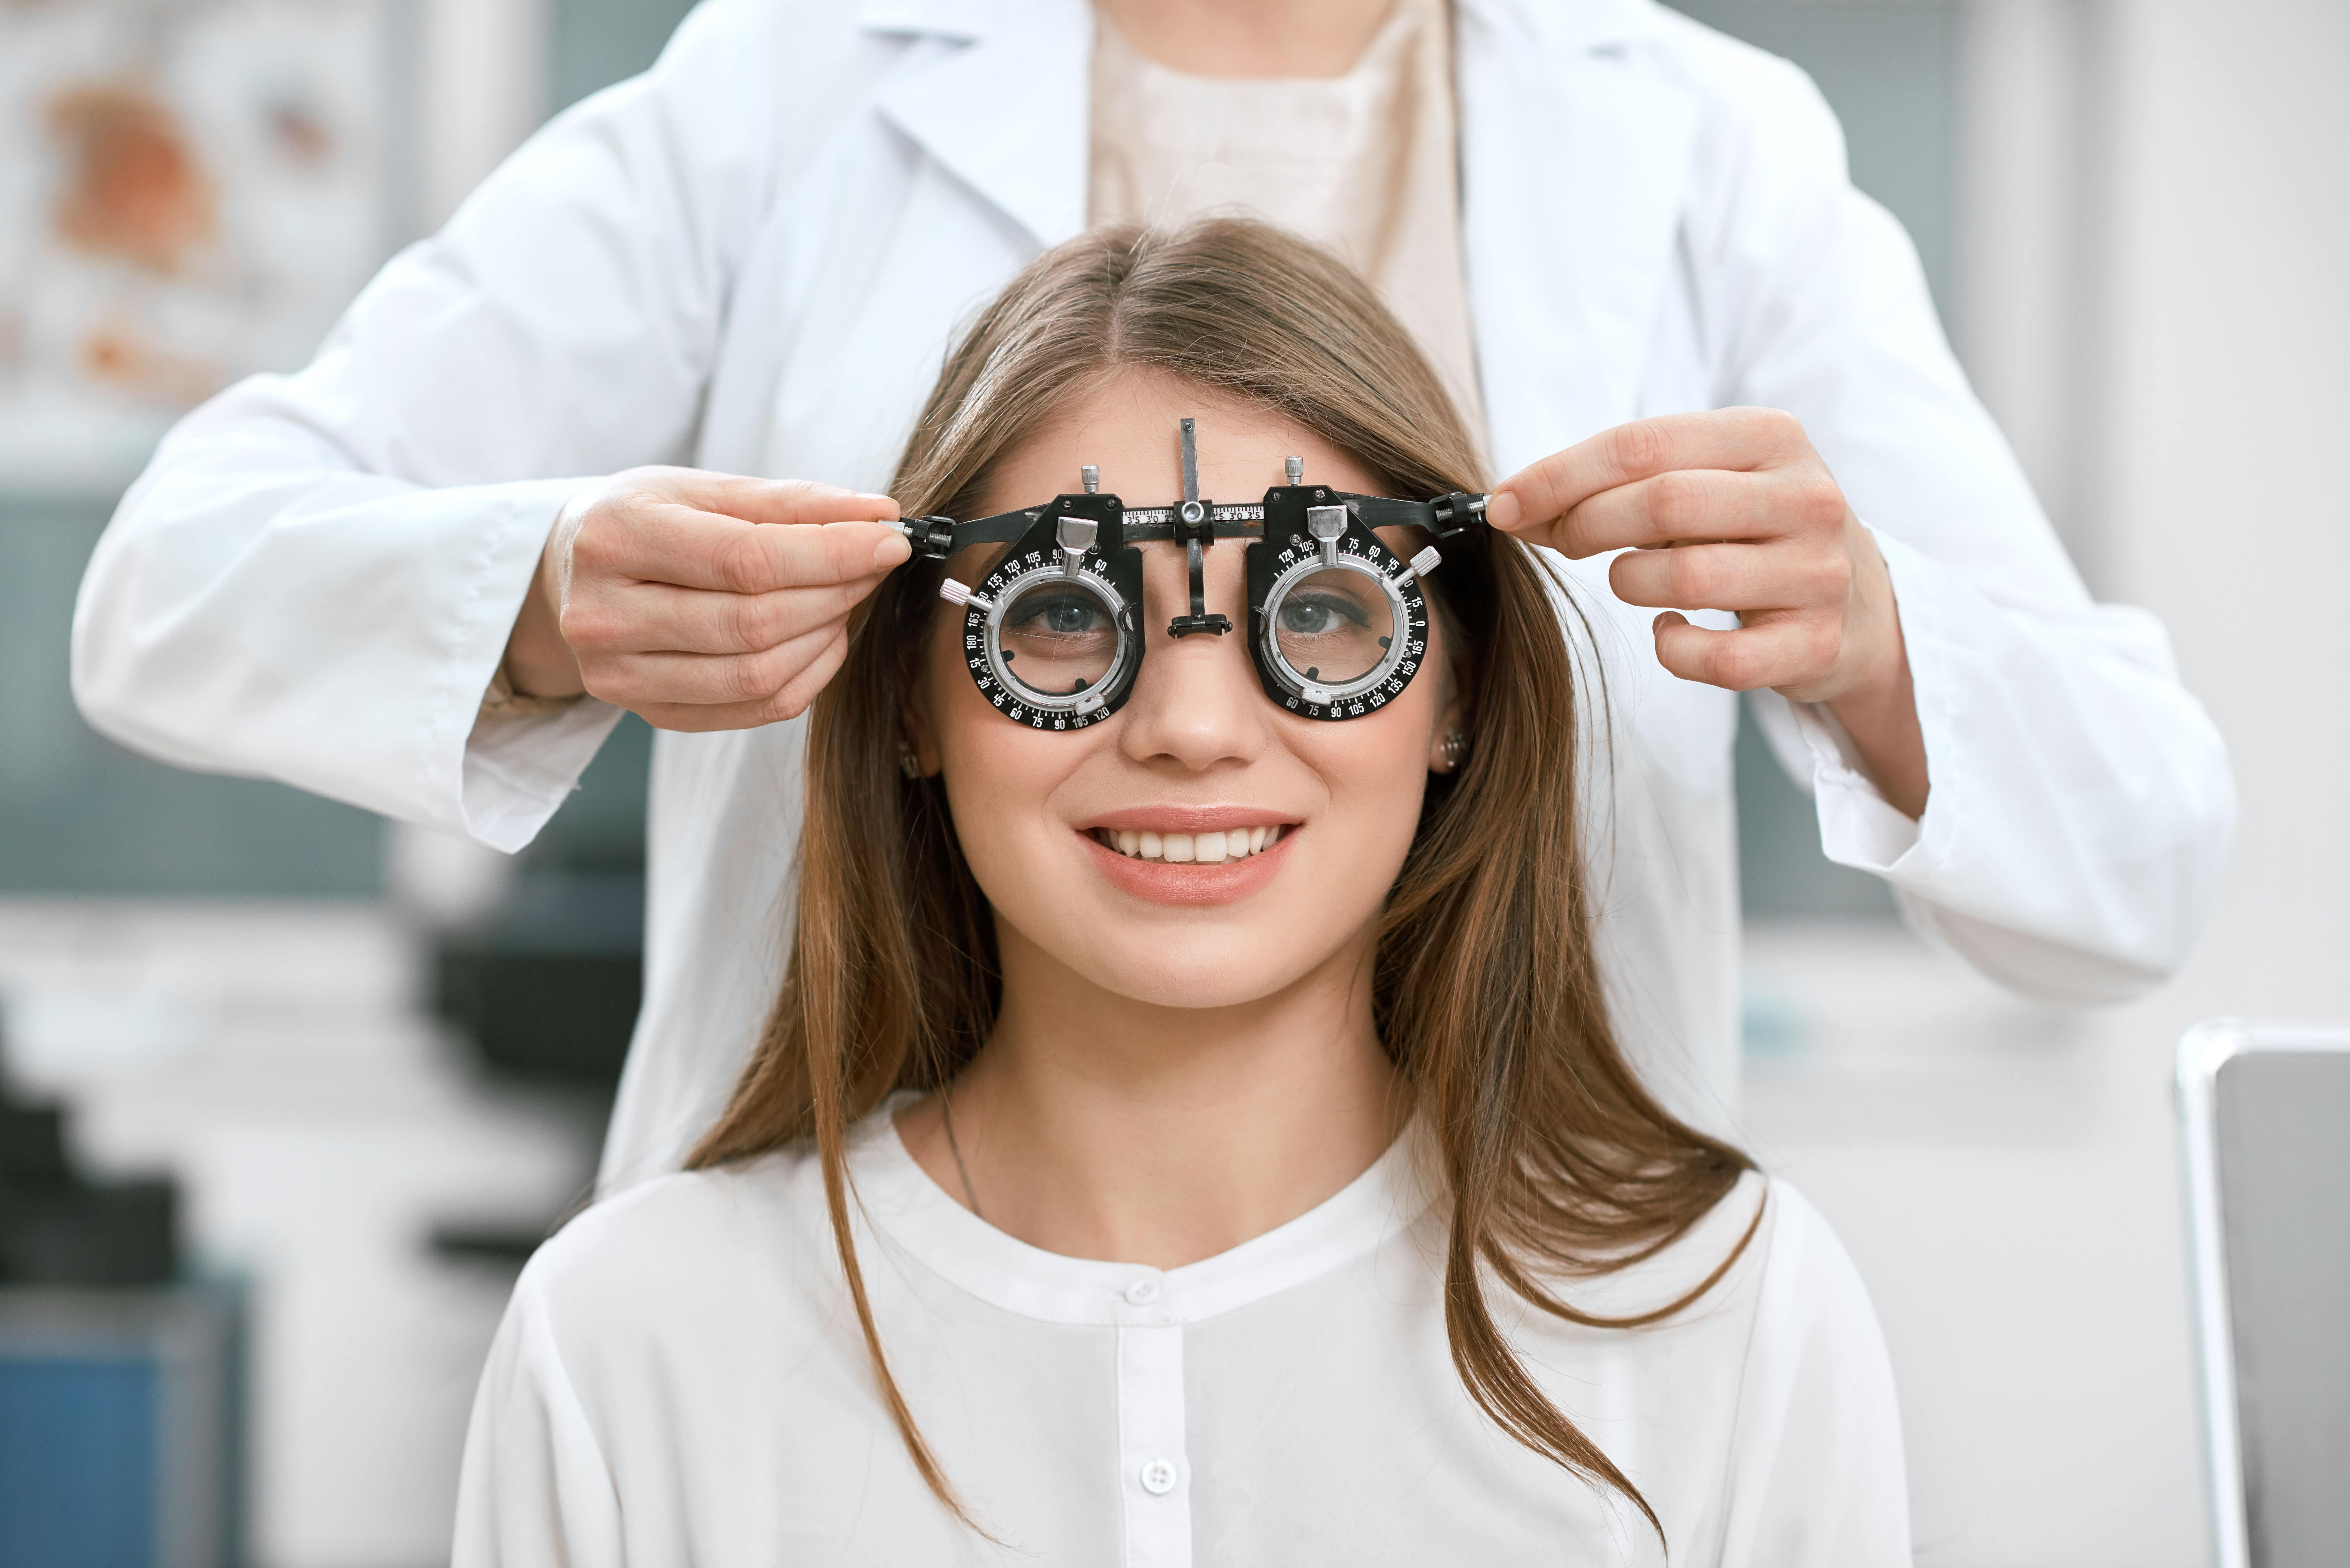 rgmu cerc oftalmologie